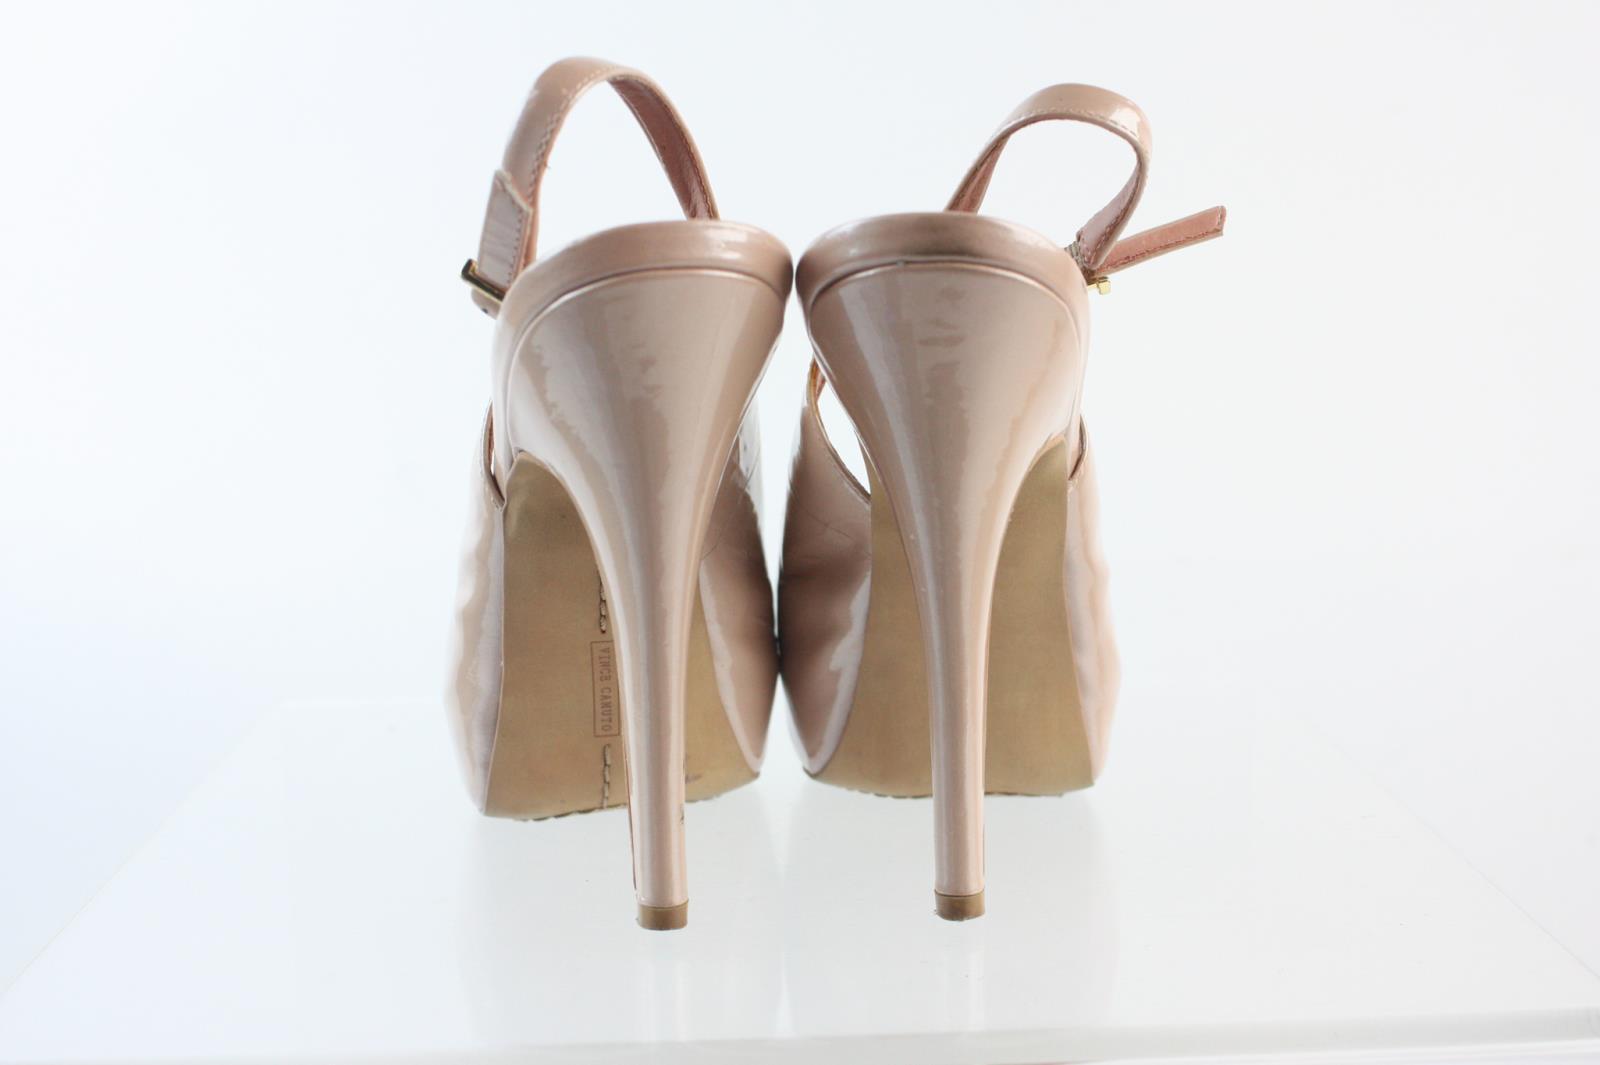 9bcbdd57508 Vince Camuto Rose Gold Patent Leather Platform High Heel Ankle Strap ...